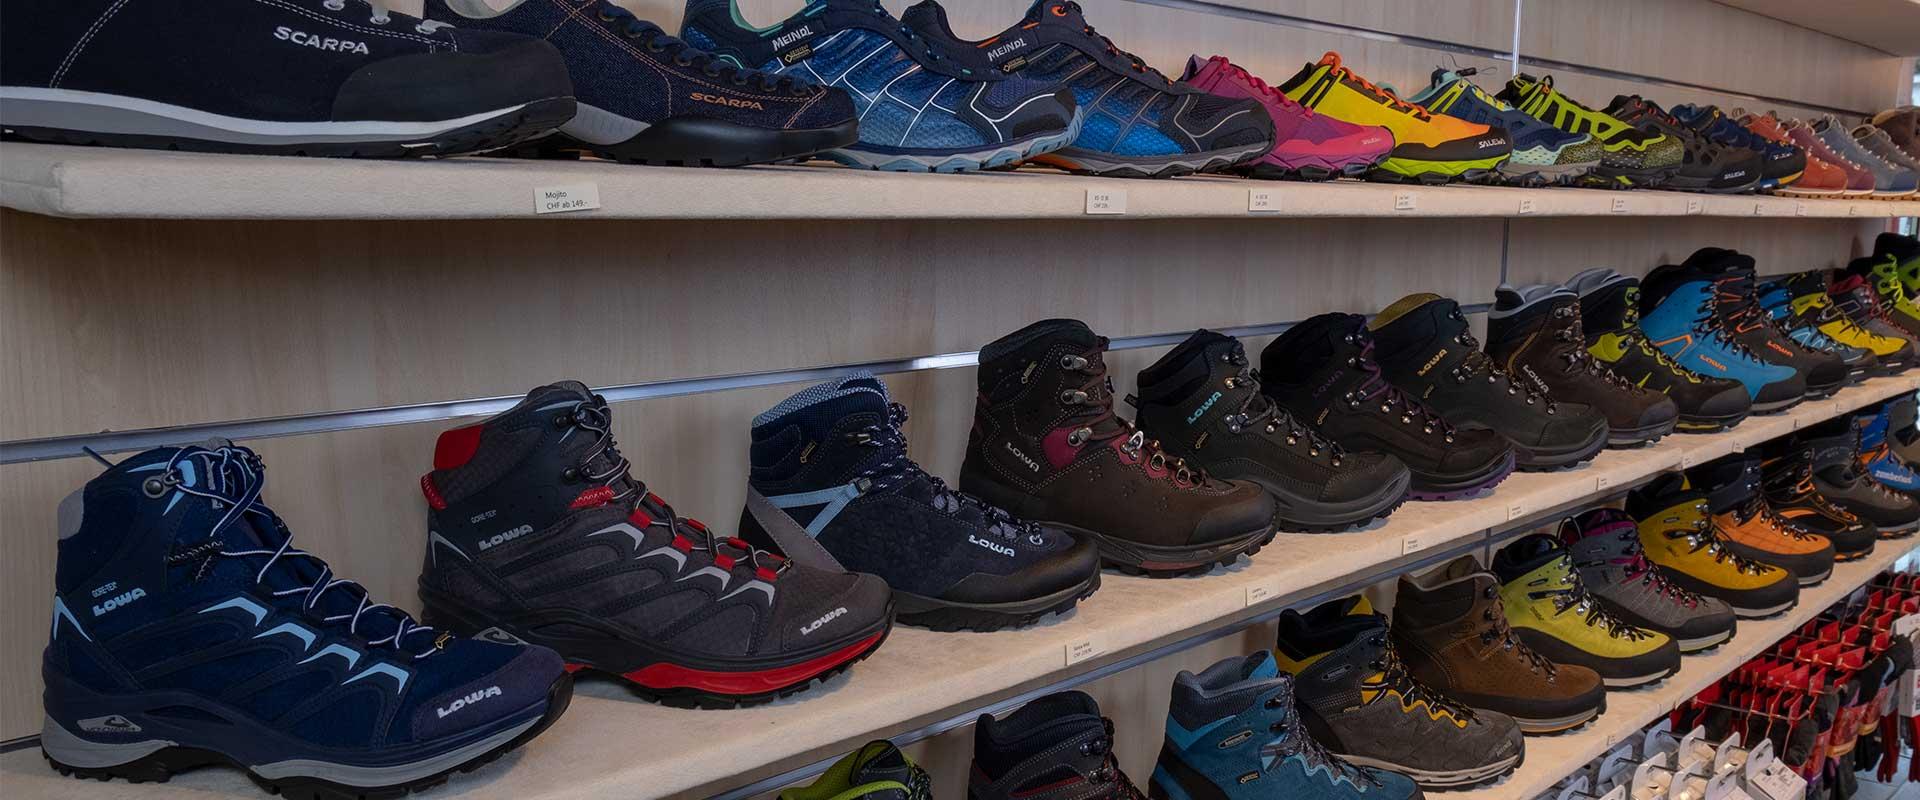 Schuhe-Strubelsport-Lenk